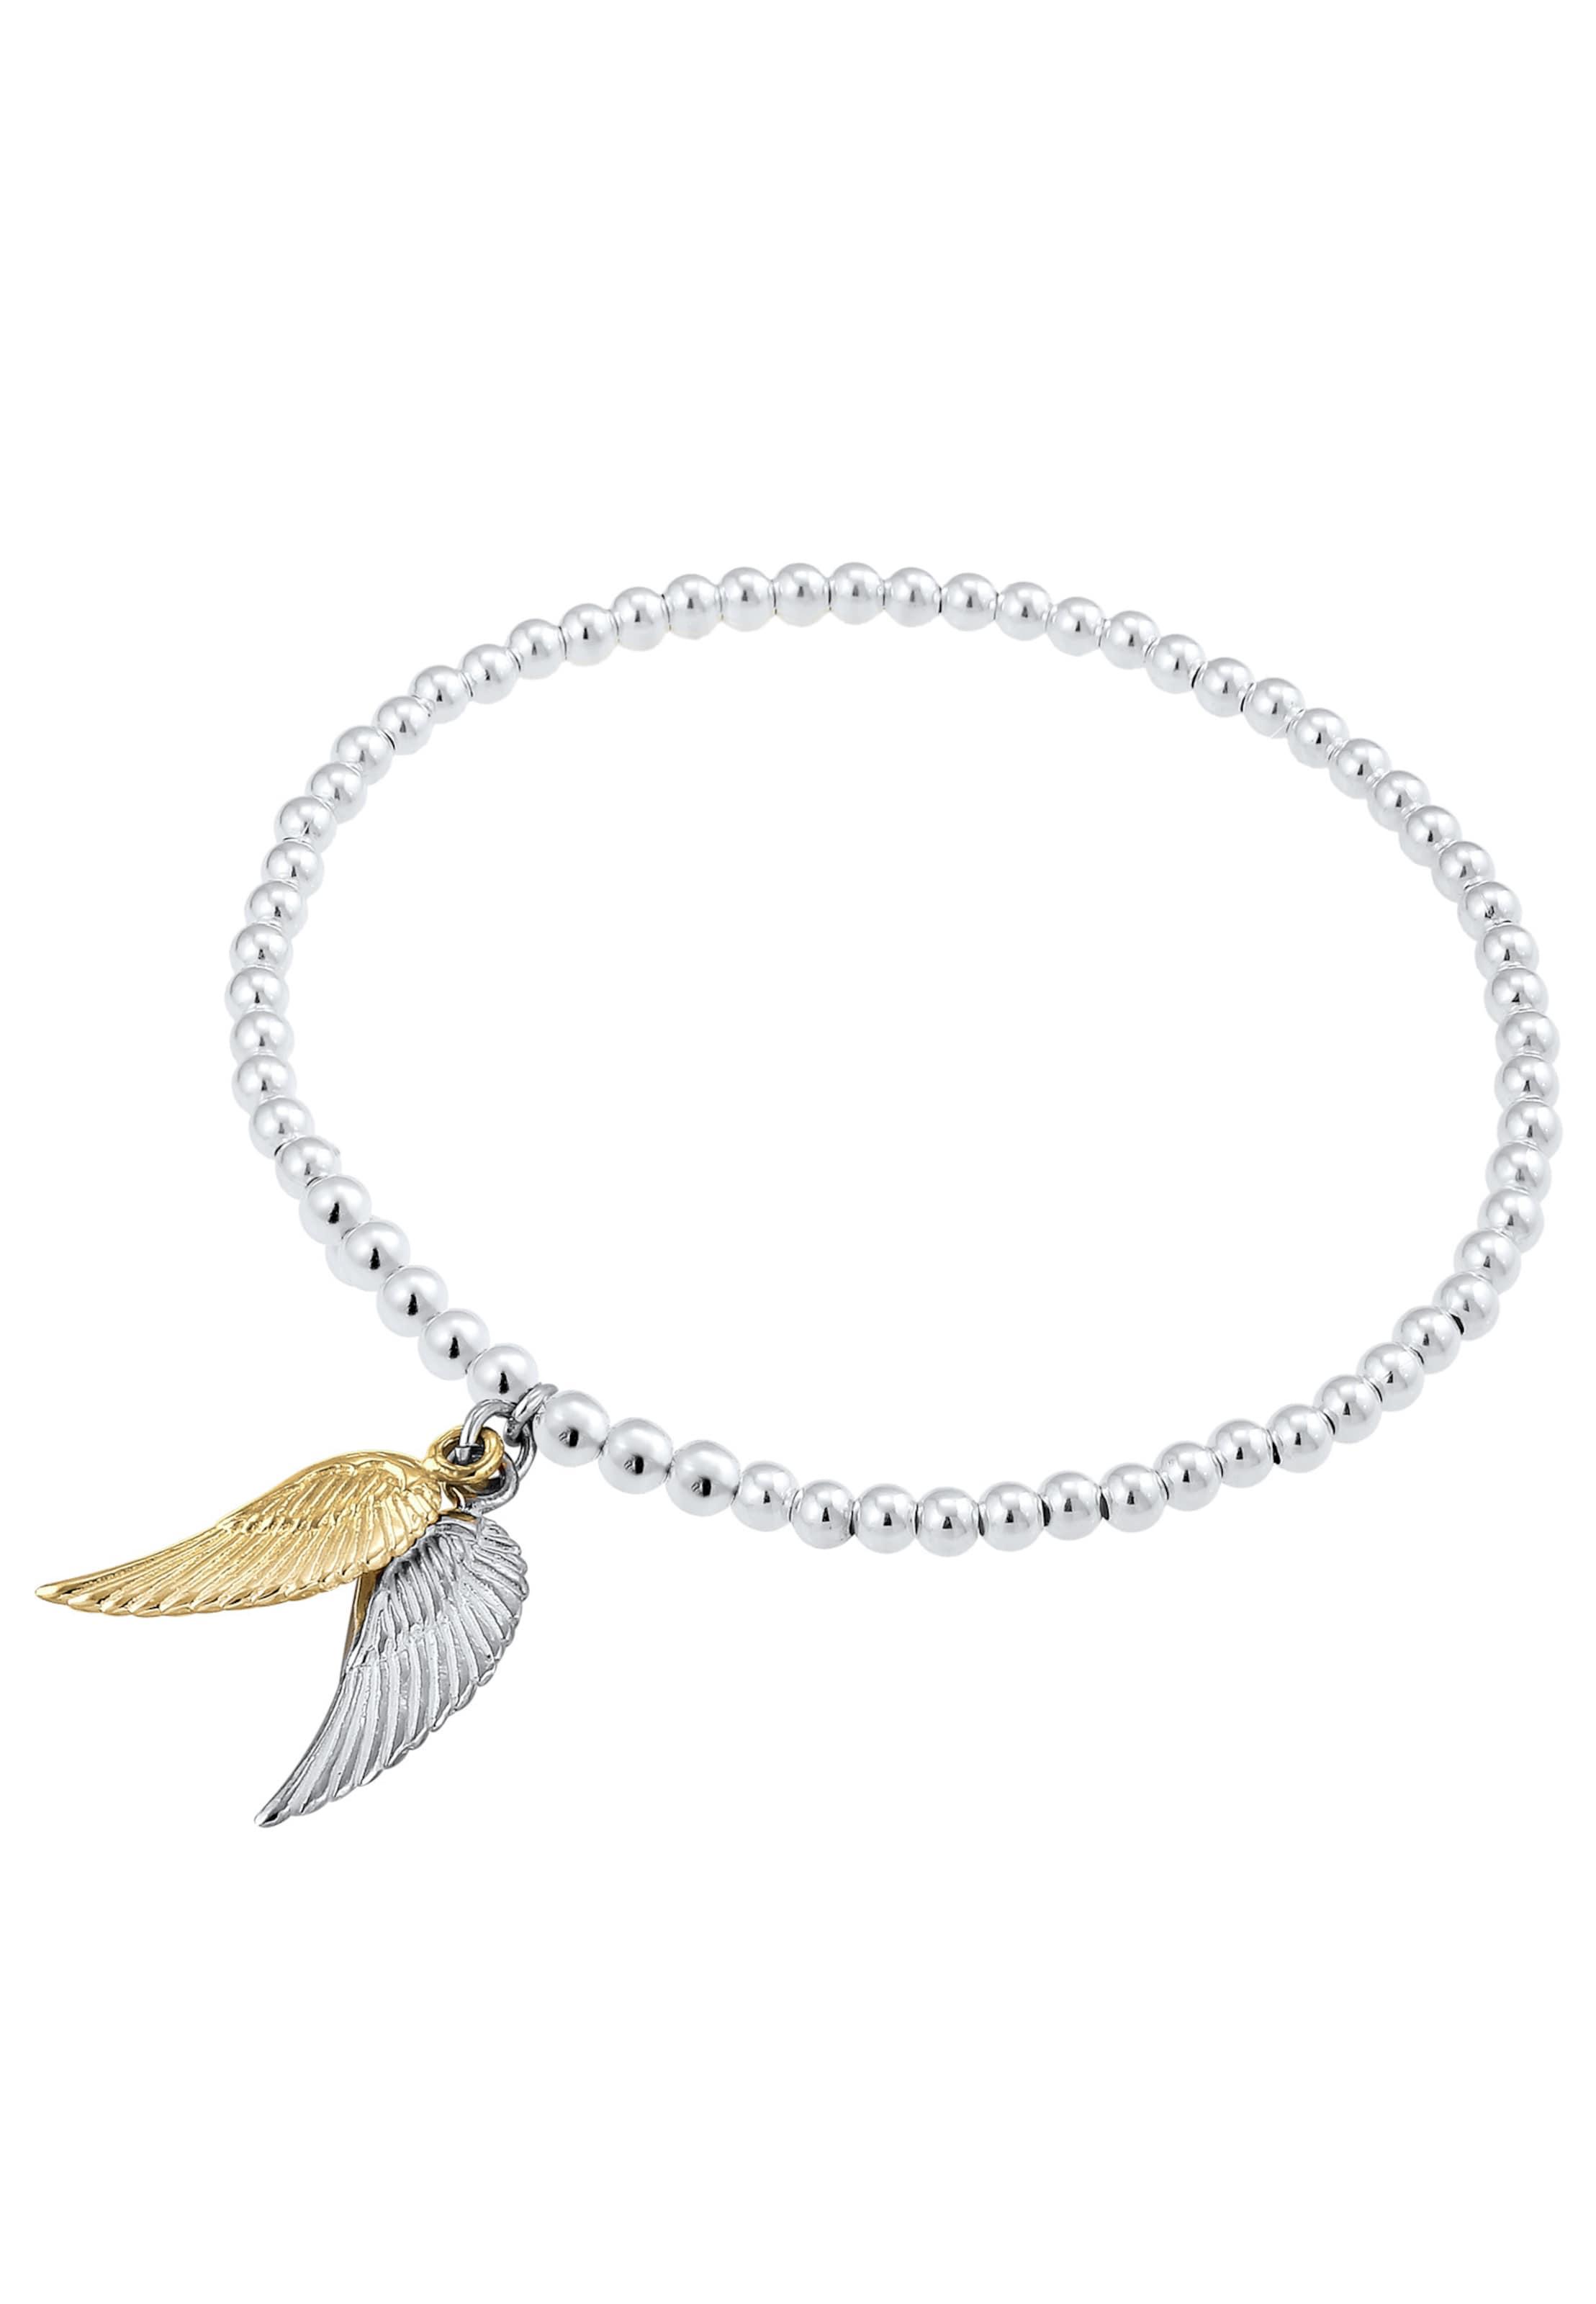 GoldSilber In Elli GoldSilber Armband Elli Elli Armband In jL3A4q5R